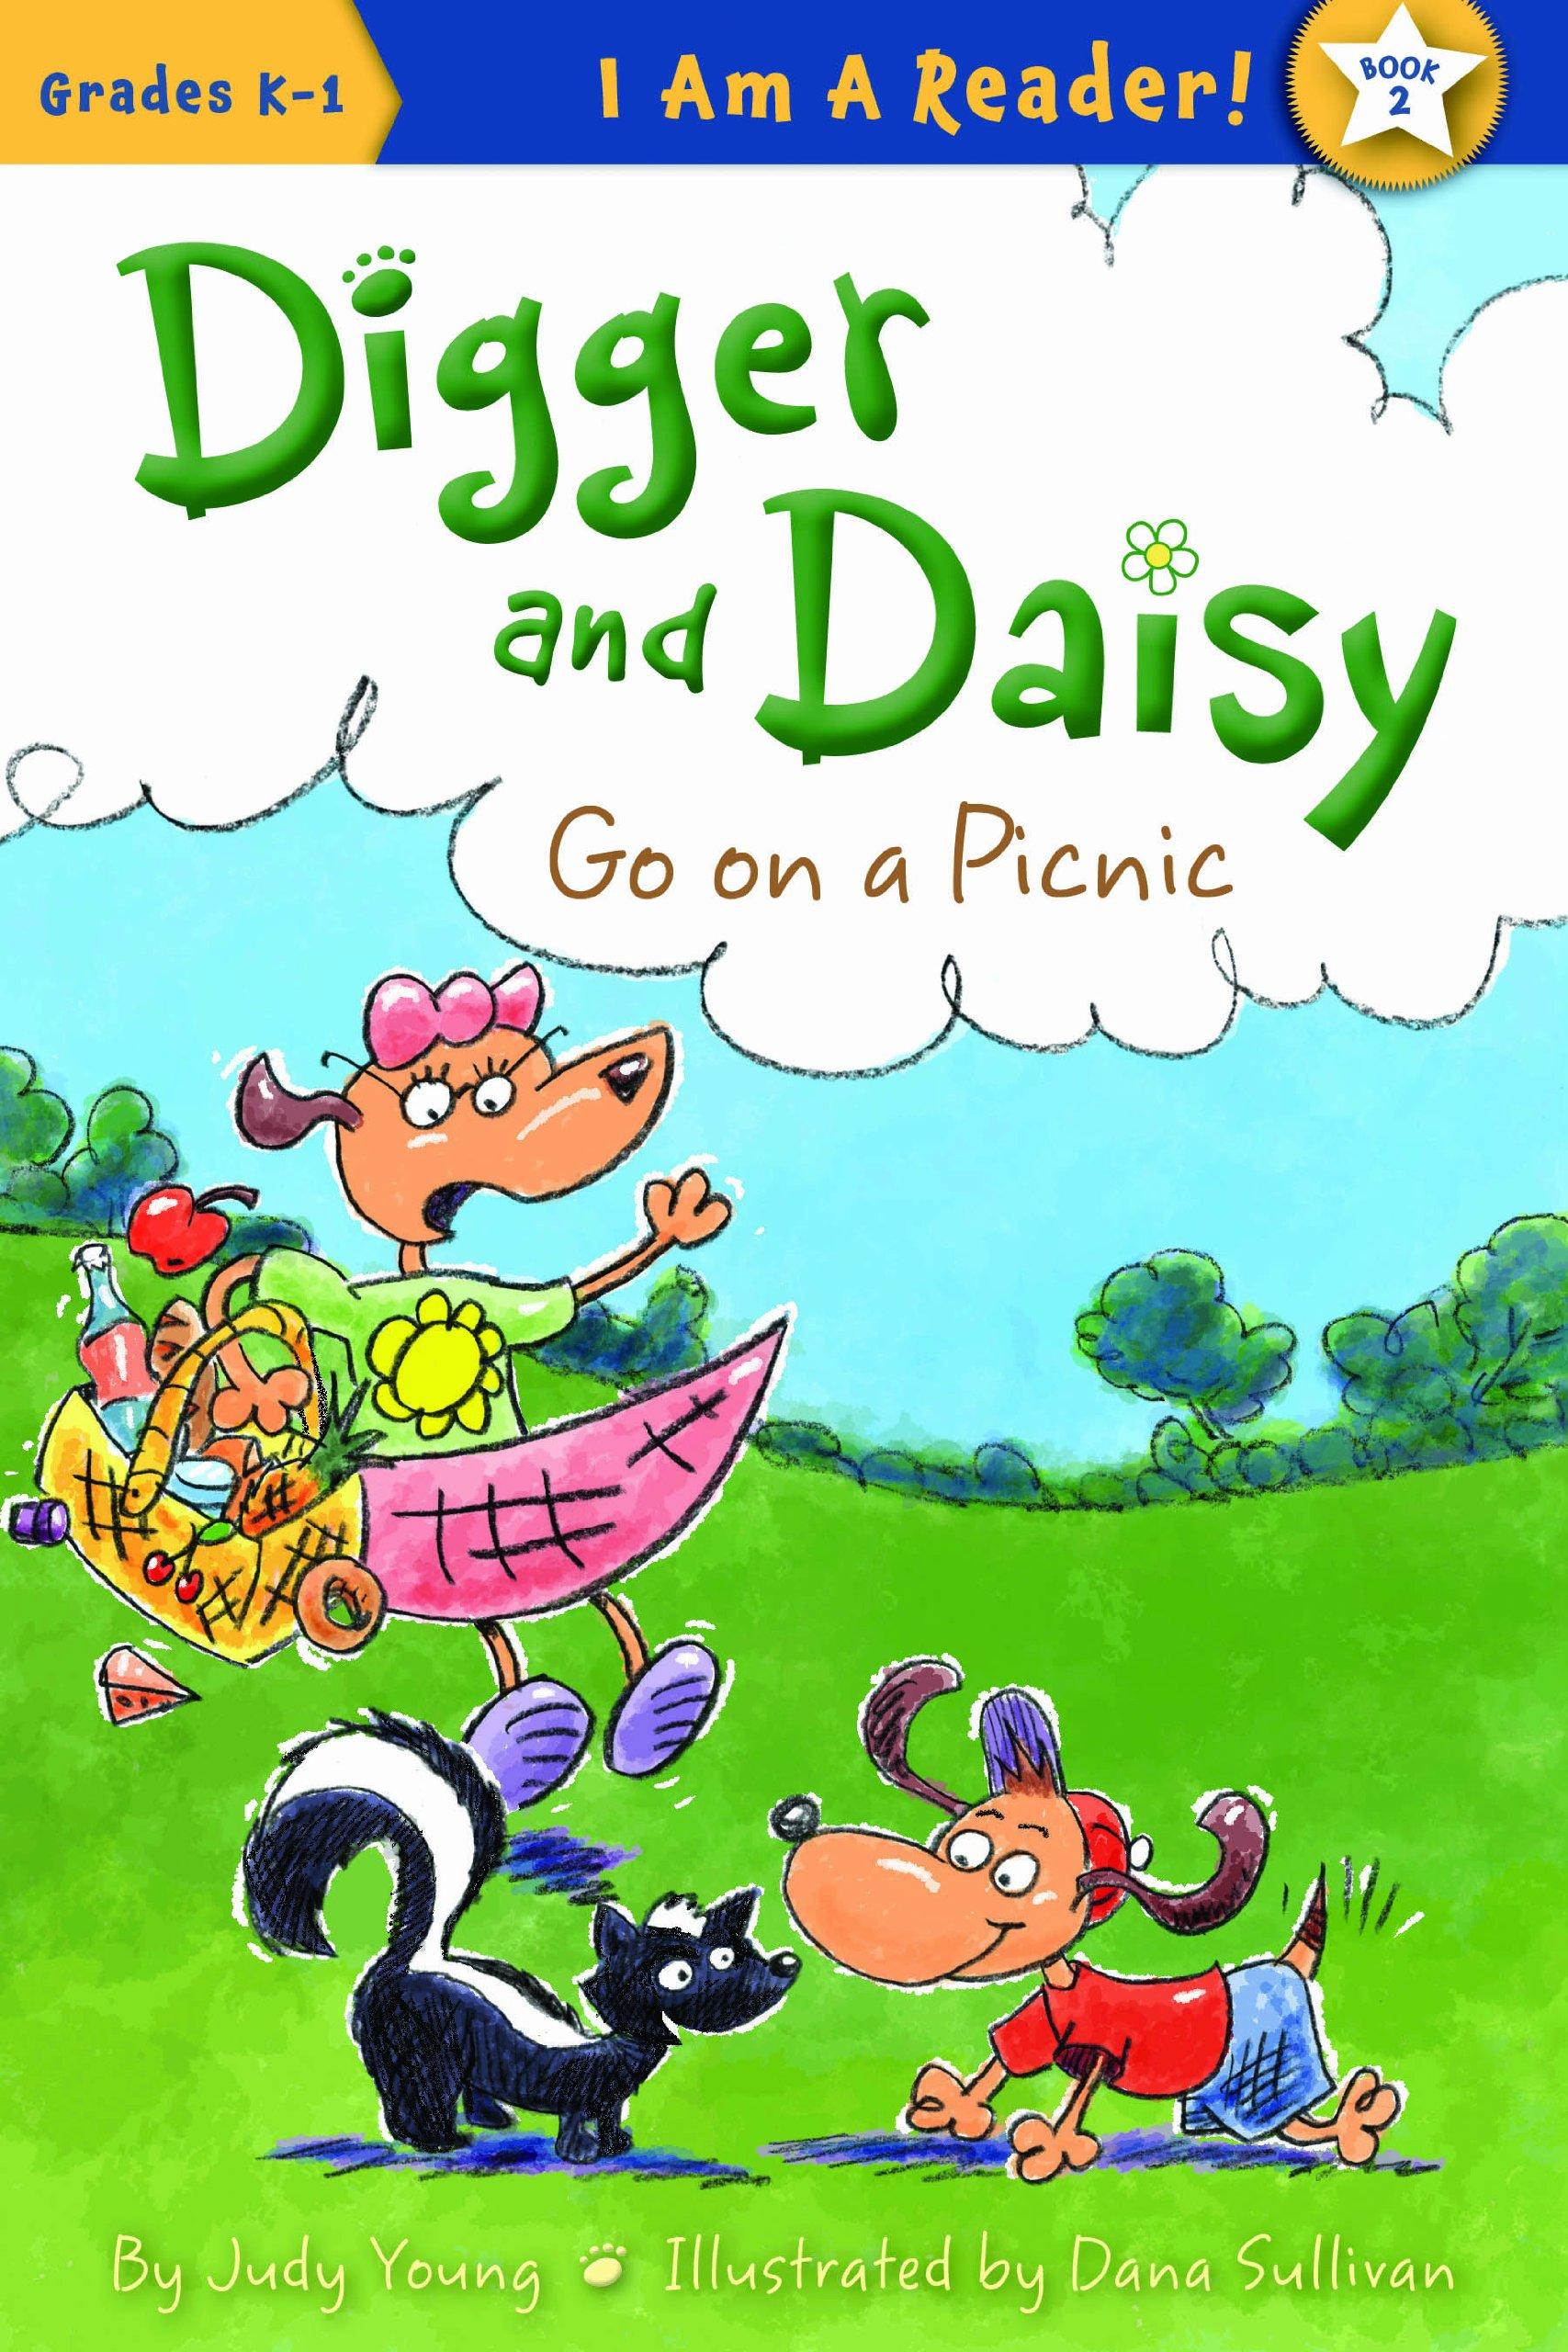 Digger Daisy Go Picnic Reader product image